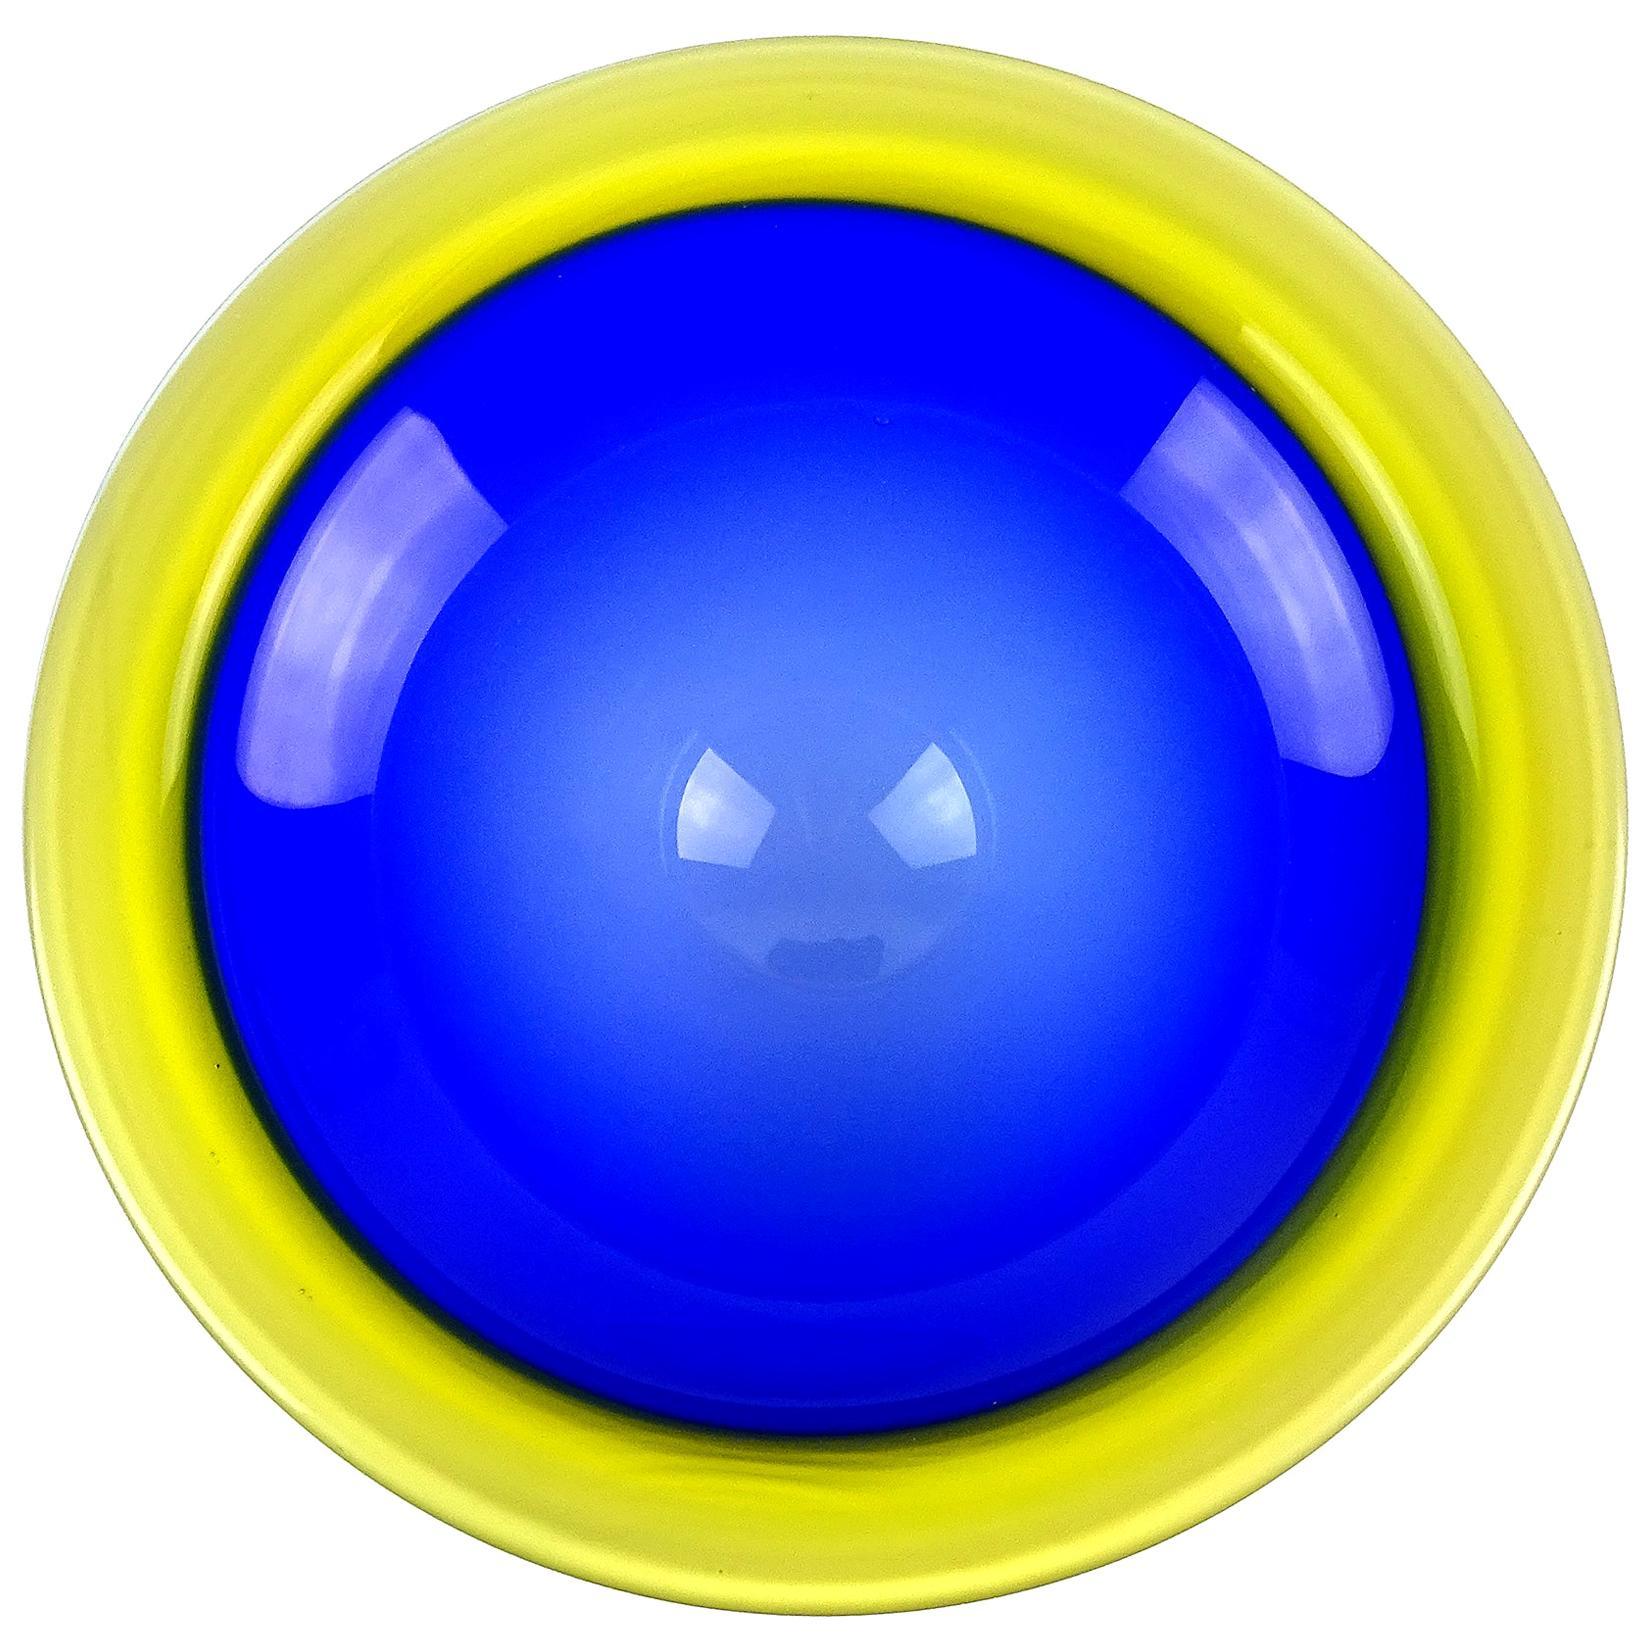 Arte Murano ICET Venezuela Bright Blue Yellow Art Glass Decorative Bowl Dish